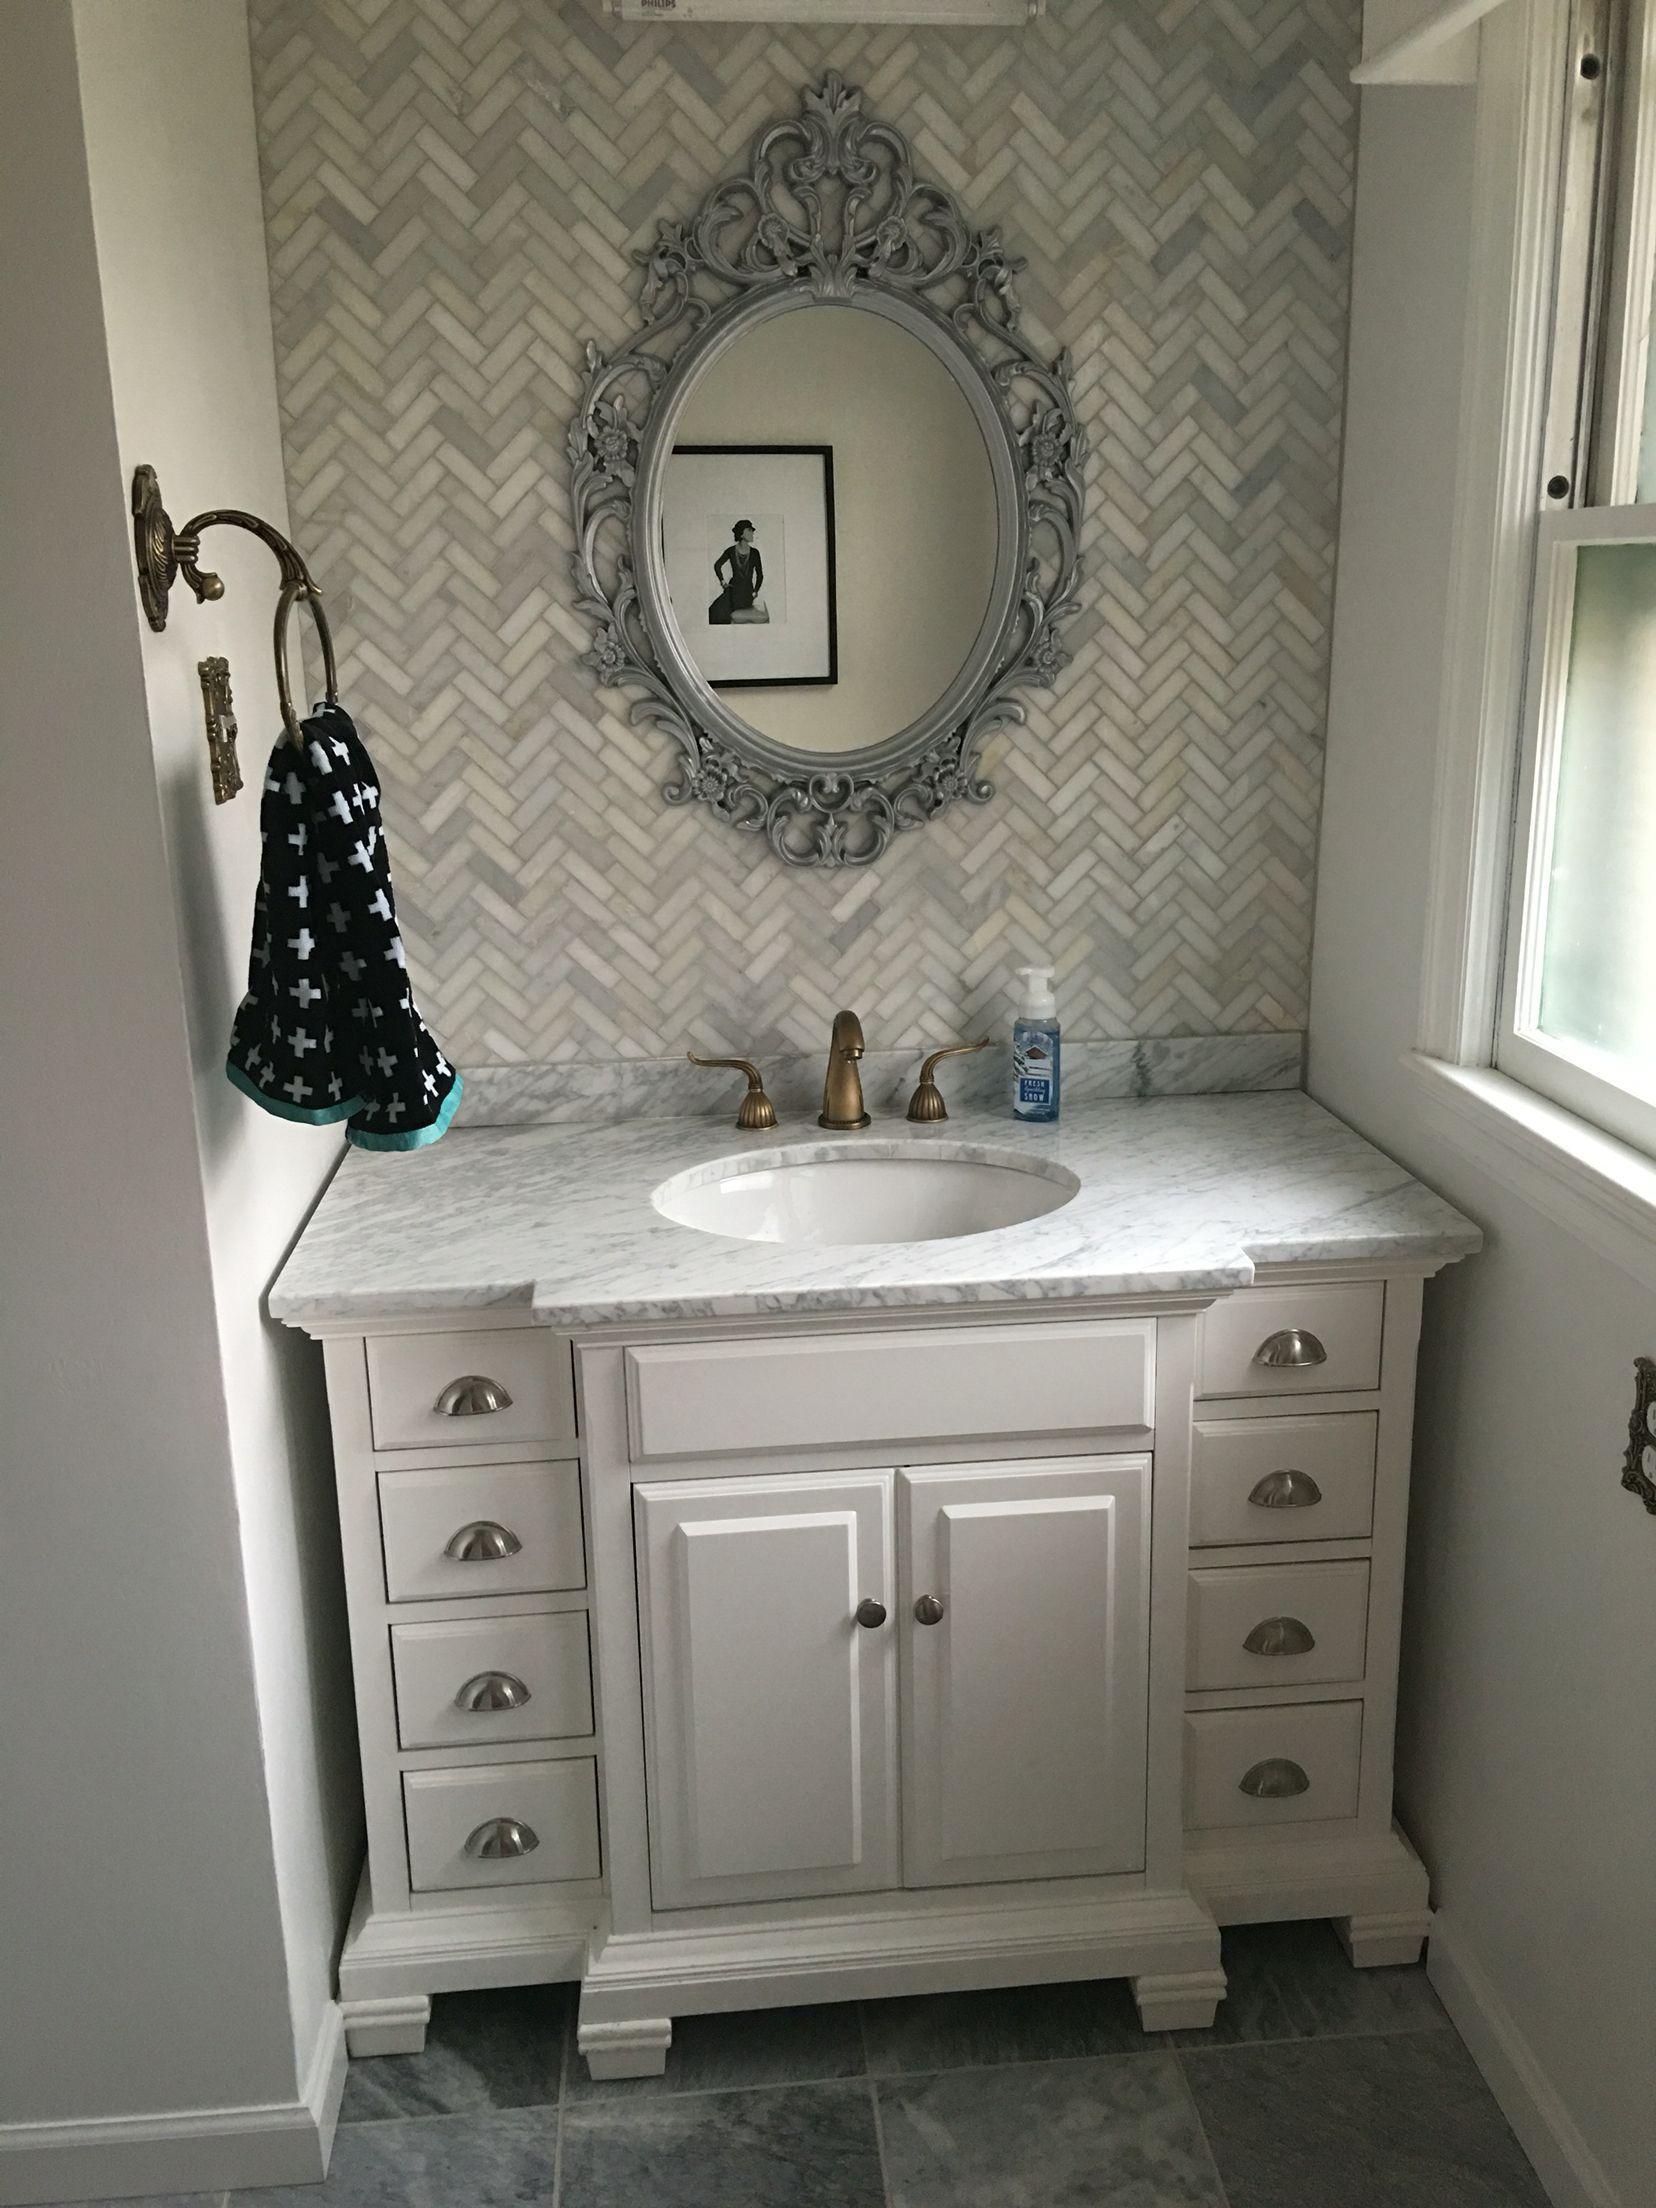 - 7+ Interesting Bathroom Backsplash Ideas - Design Ideas To Inspire